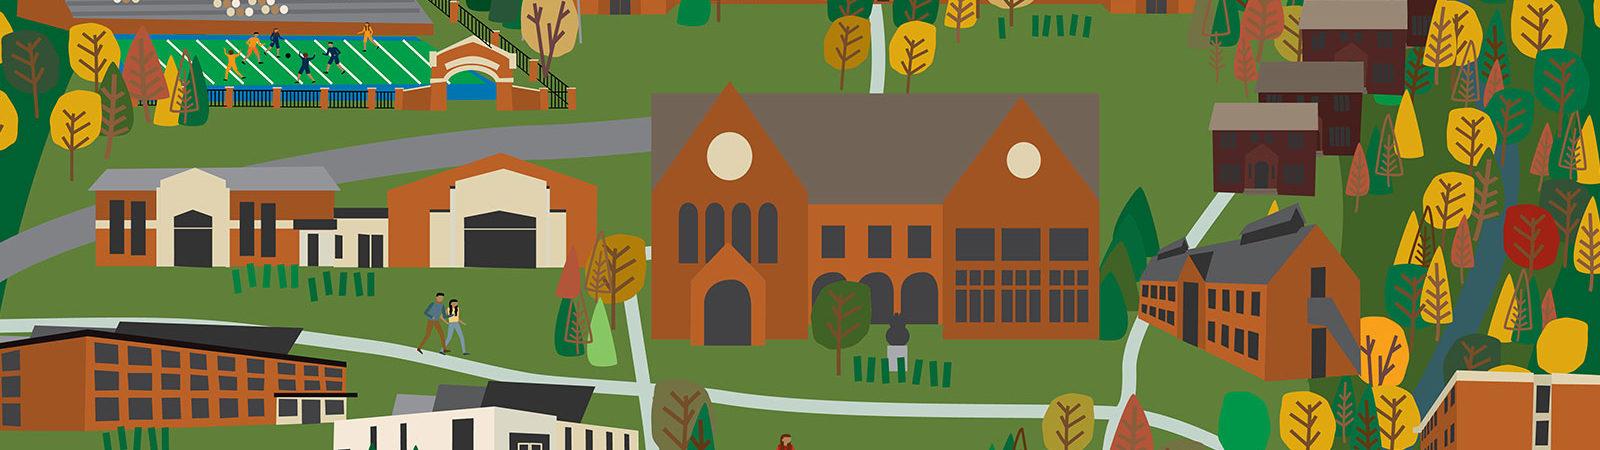 Northland College Campus illustration